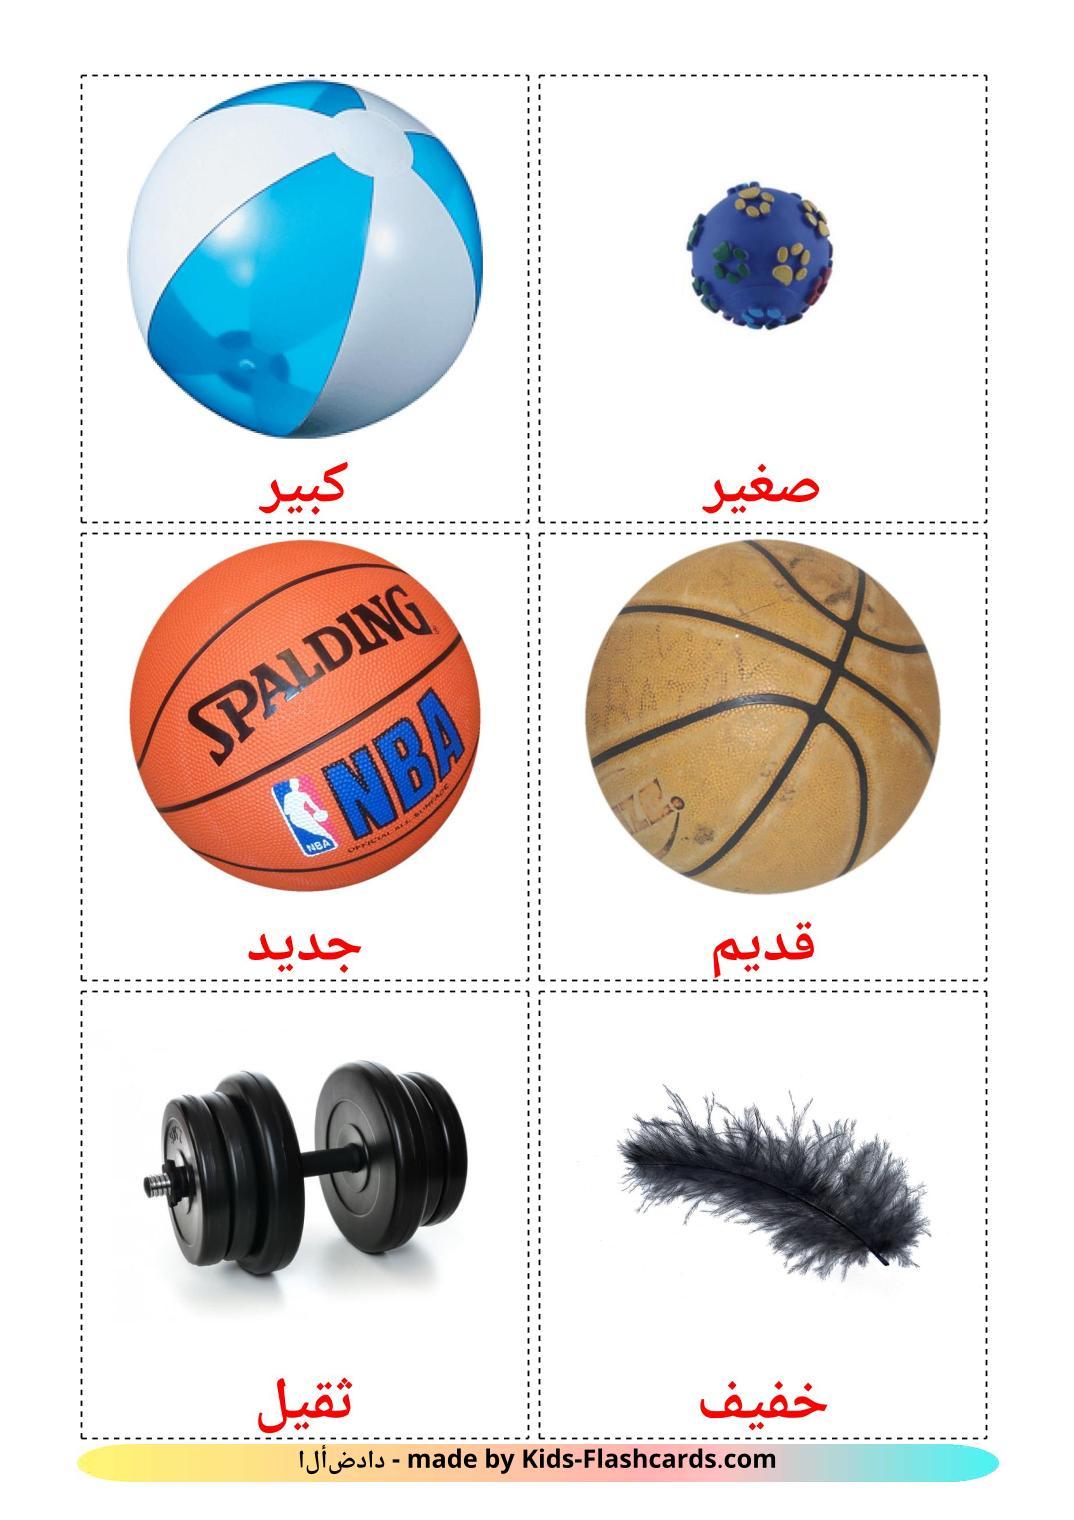 Opposites - 74 Free Printable arabic Flashcards